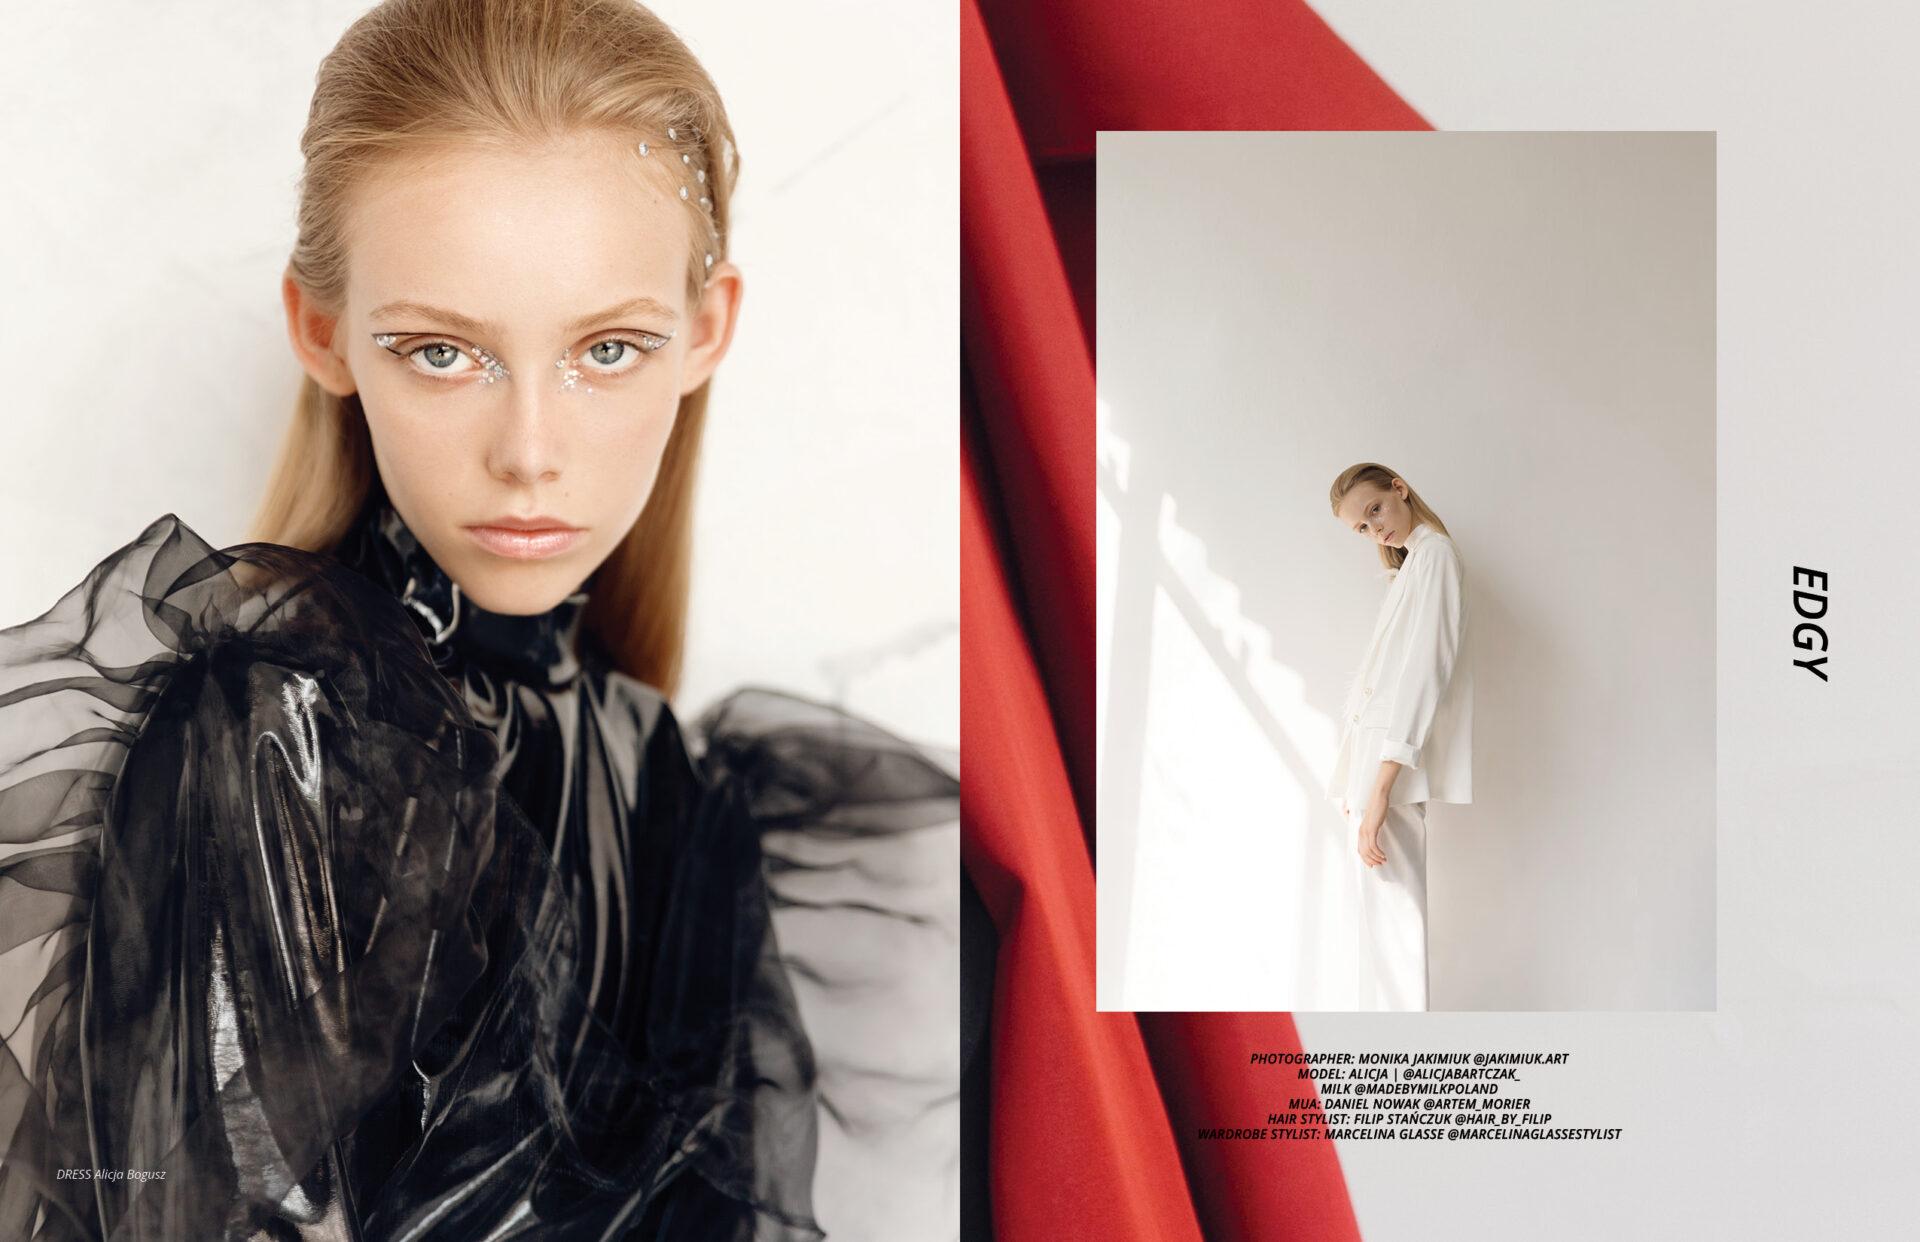 "Fashion Editorial ""Edgy"" by Monika Jakimiuk with Alicja Bartczak from Milk Agency Poland. Styling by Marcelina Glasse for KEYI Magazine"